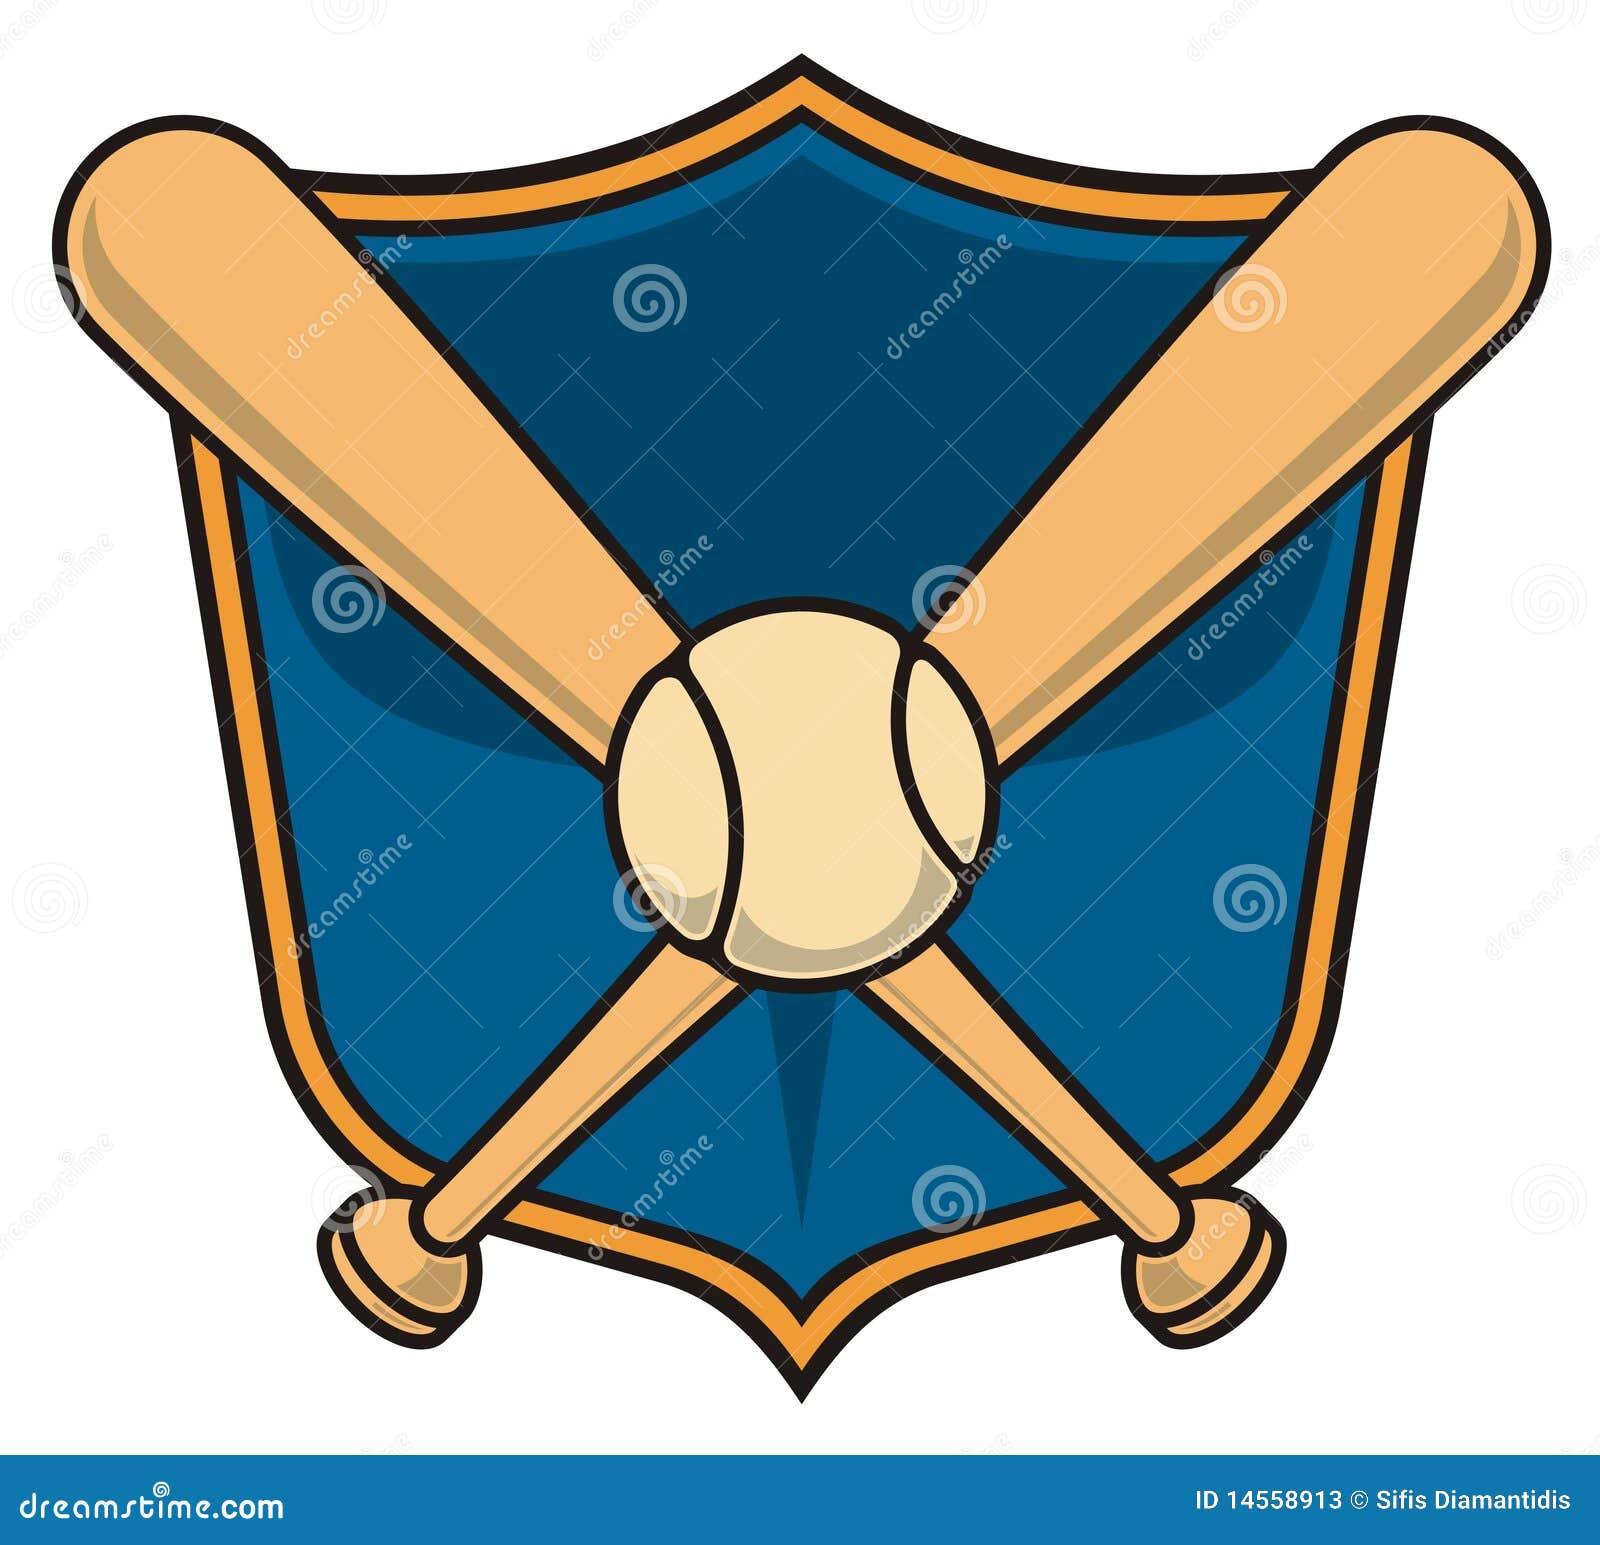 Baseball shield